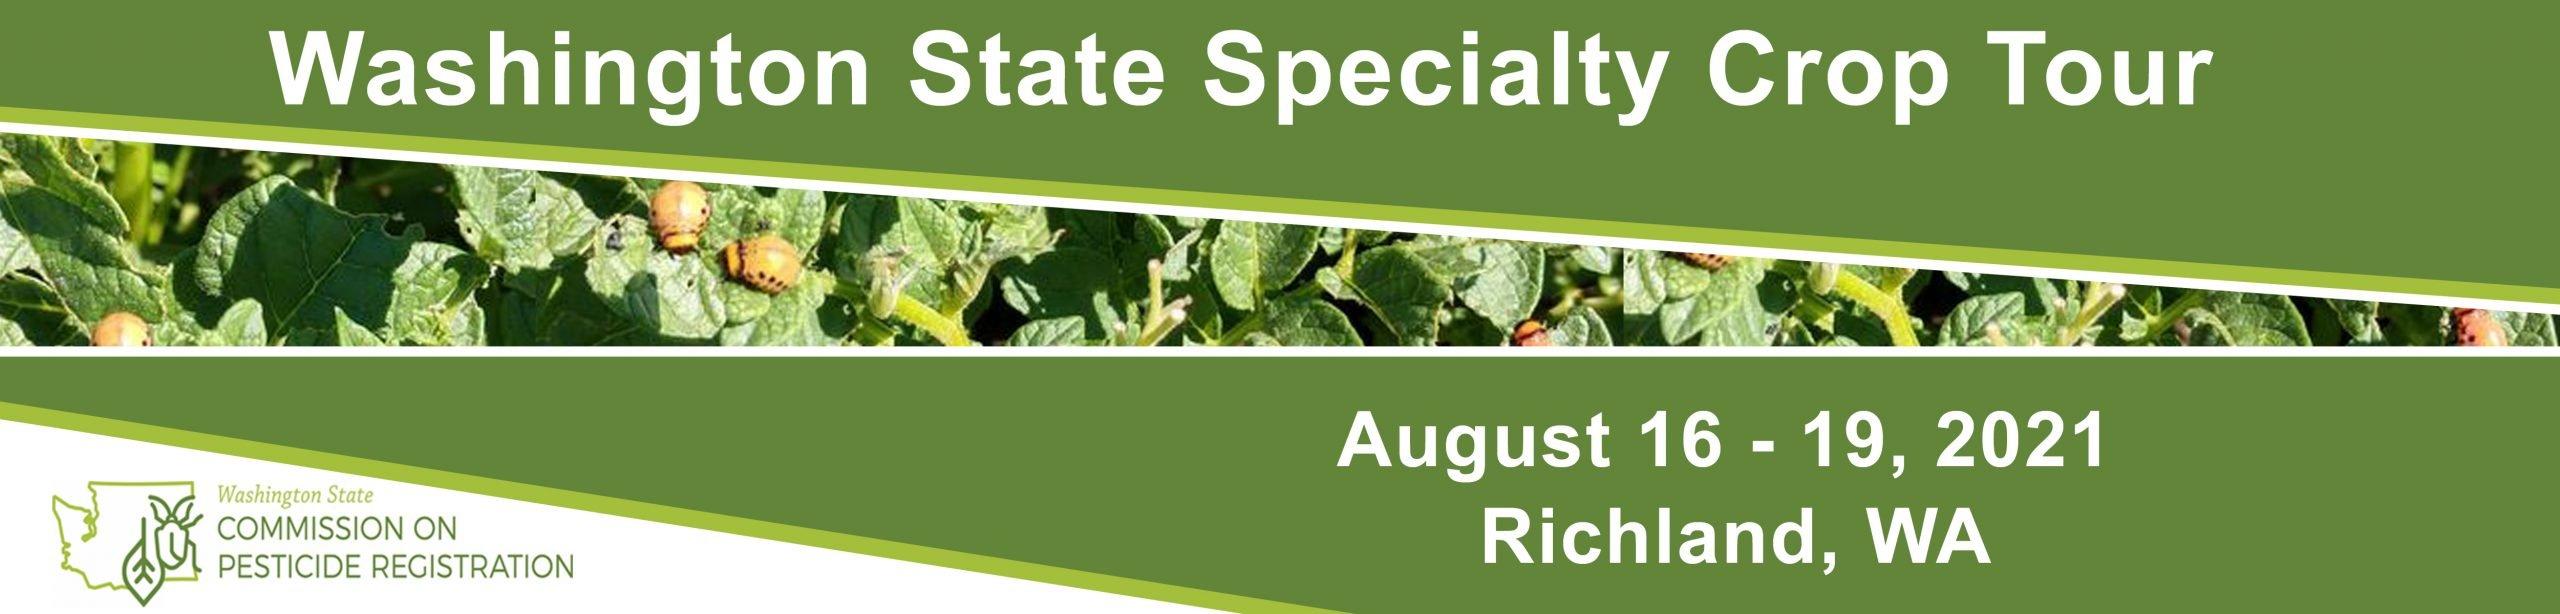 Washington State Specialty Crop Tour - August 16-19, 2021